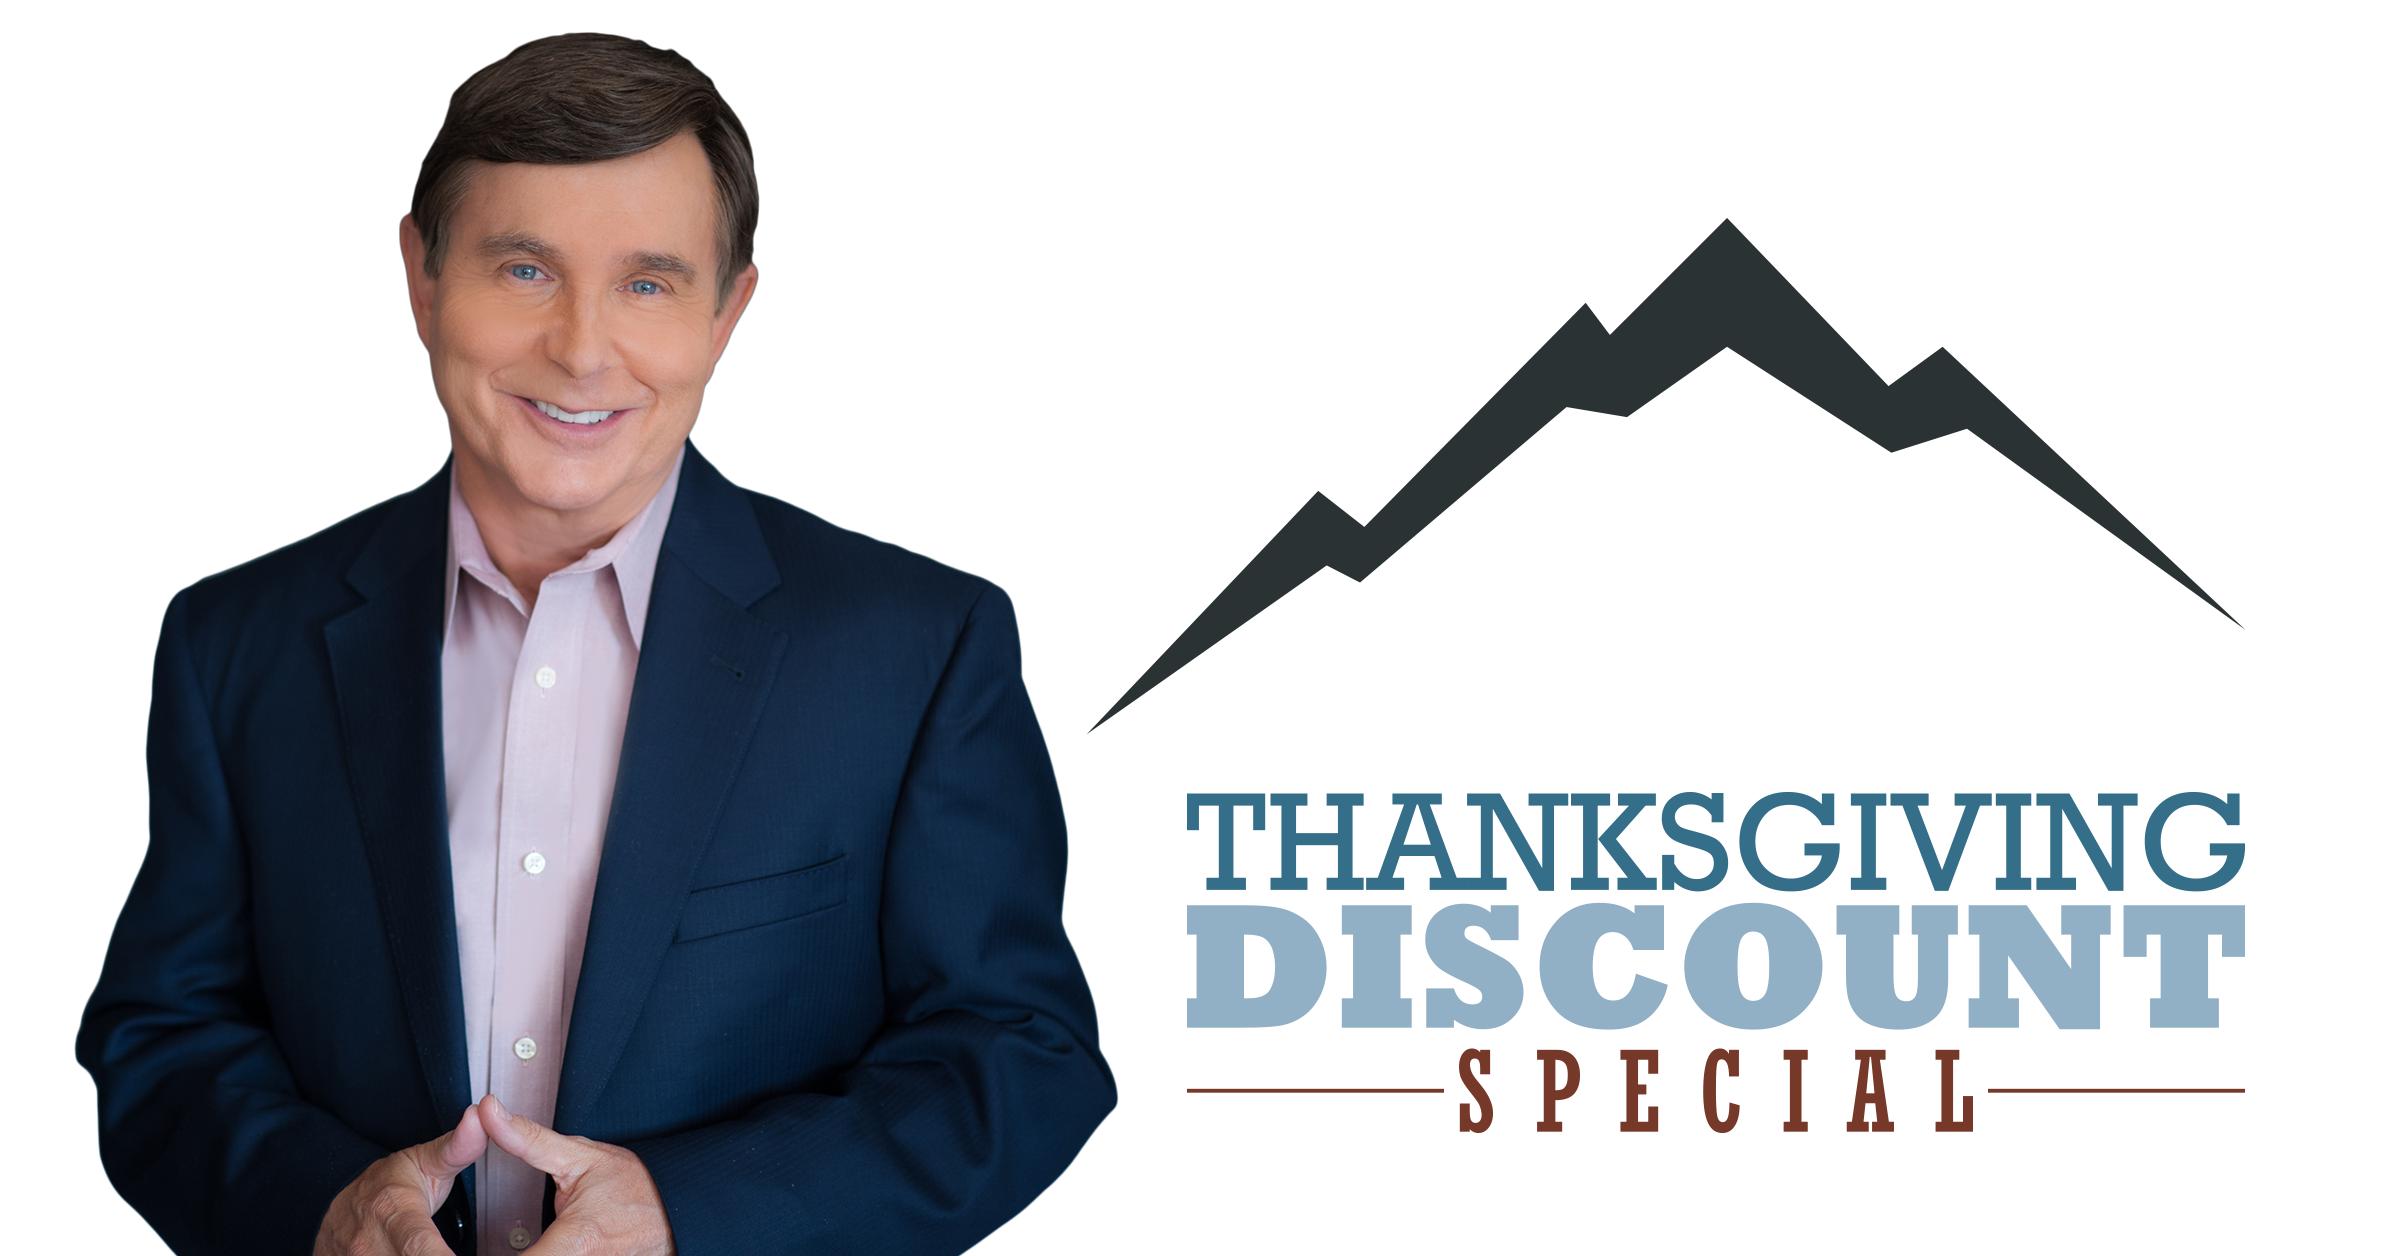 Thanksgiving Sale Success Splash